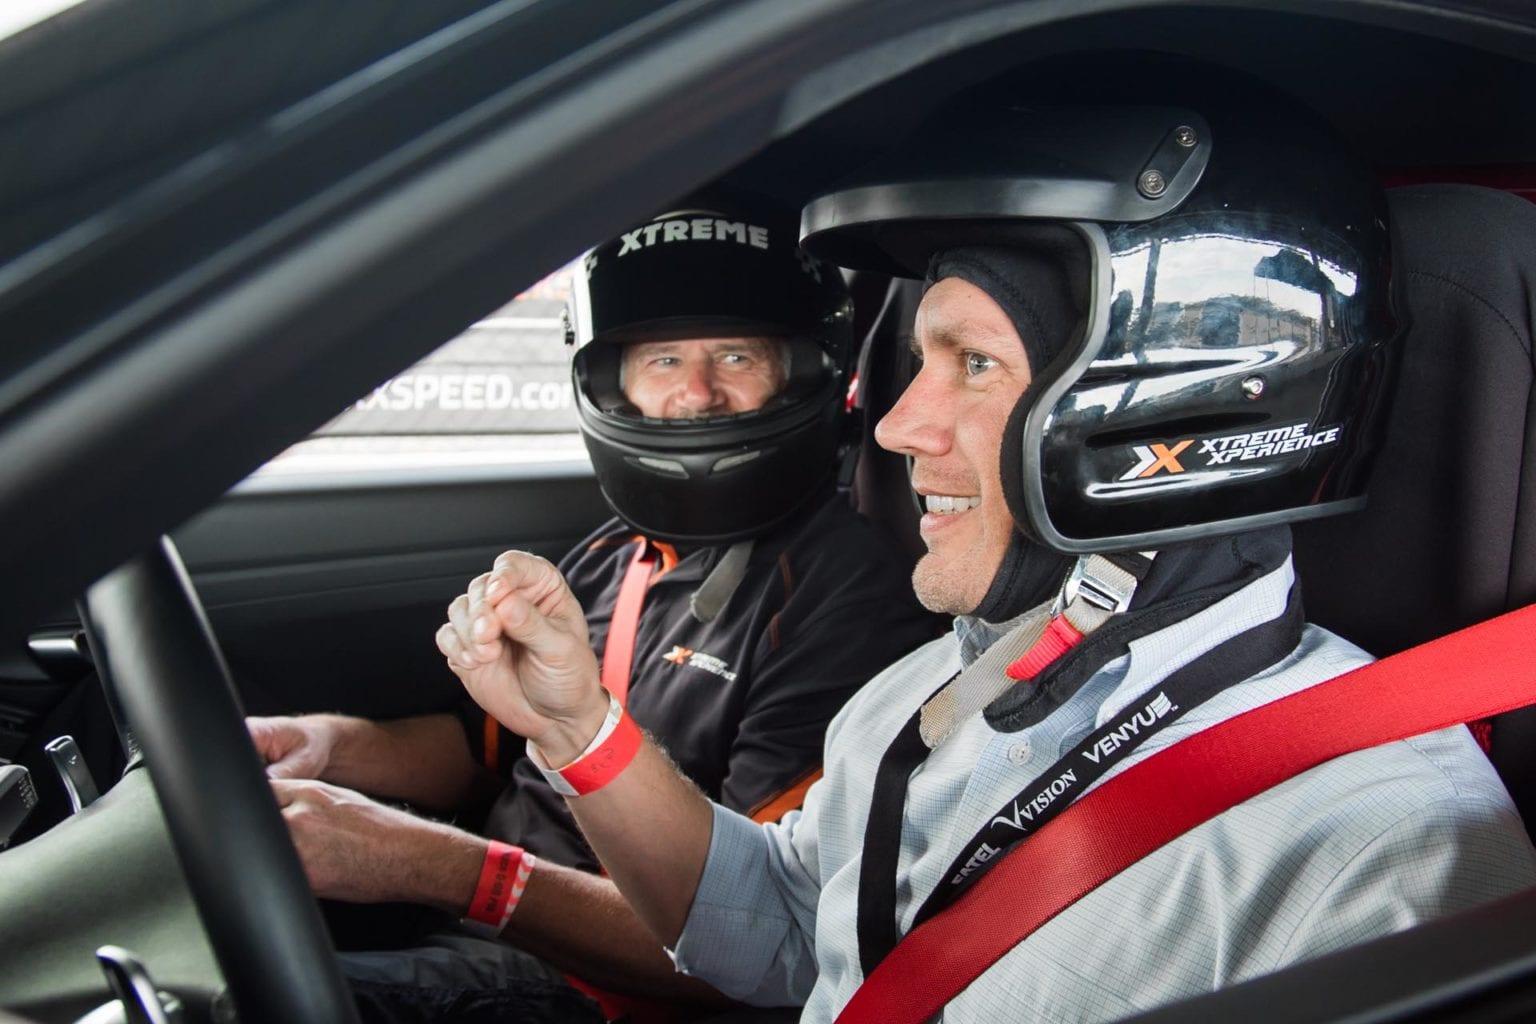 Inside Race Car